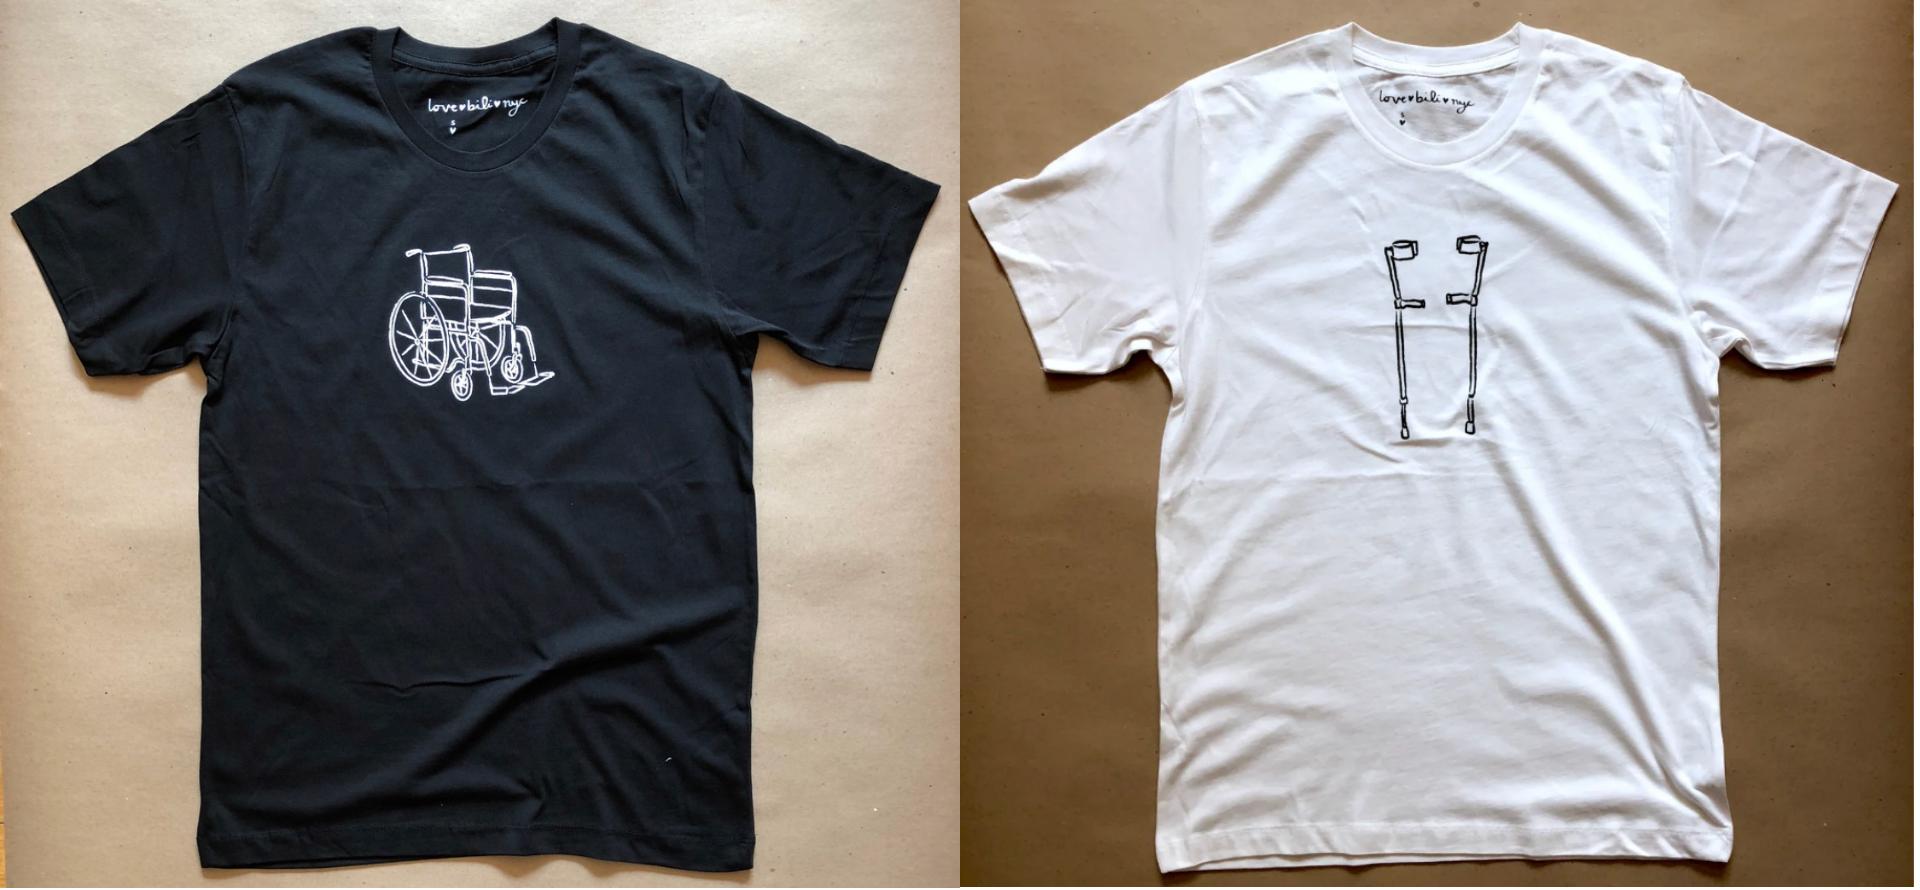 (left) A black ♡bili shirt with white wheelchair design; (right) A white ♡bili shirt with black walking sticks design